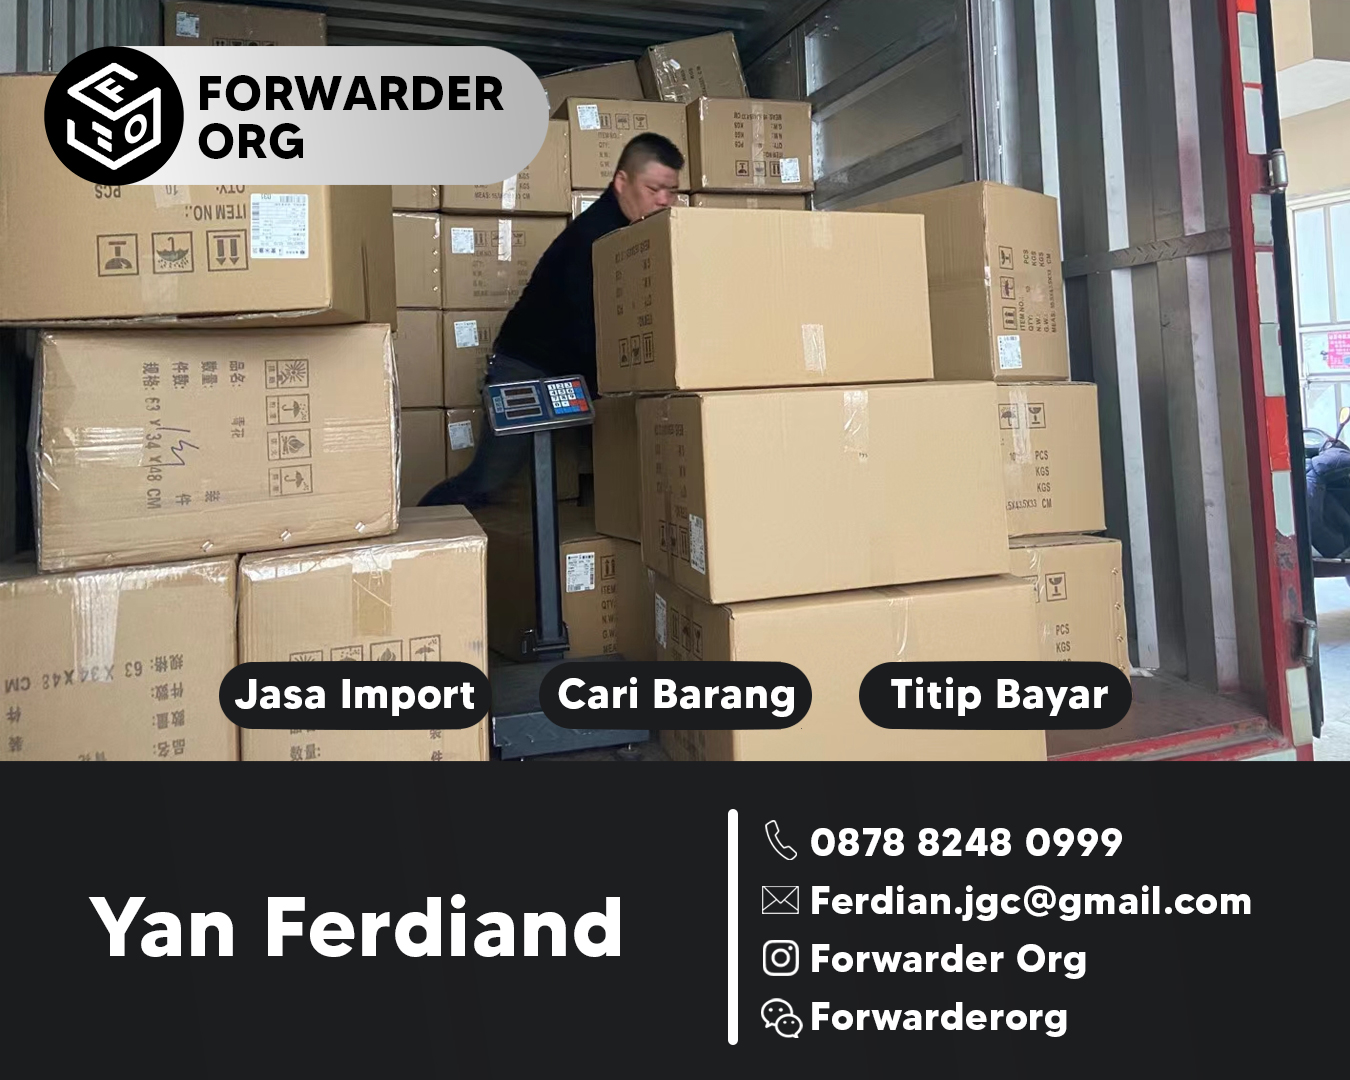 Jasa Import dan Pembelian Dari China Free Admin | FORWARDER ORG